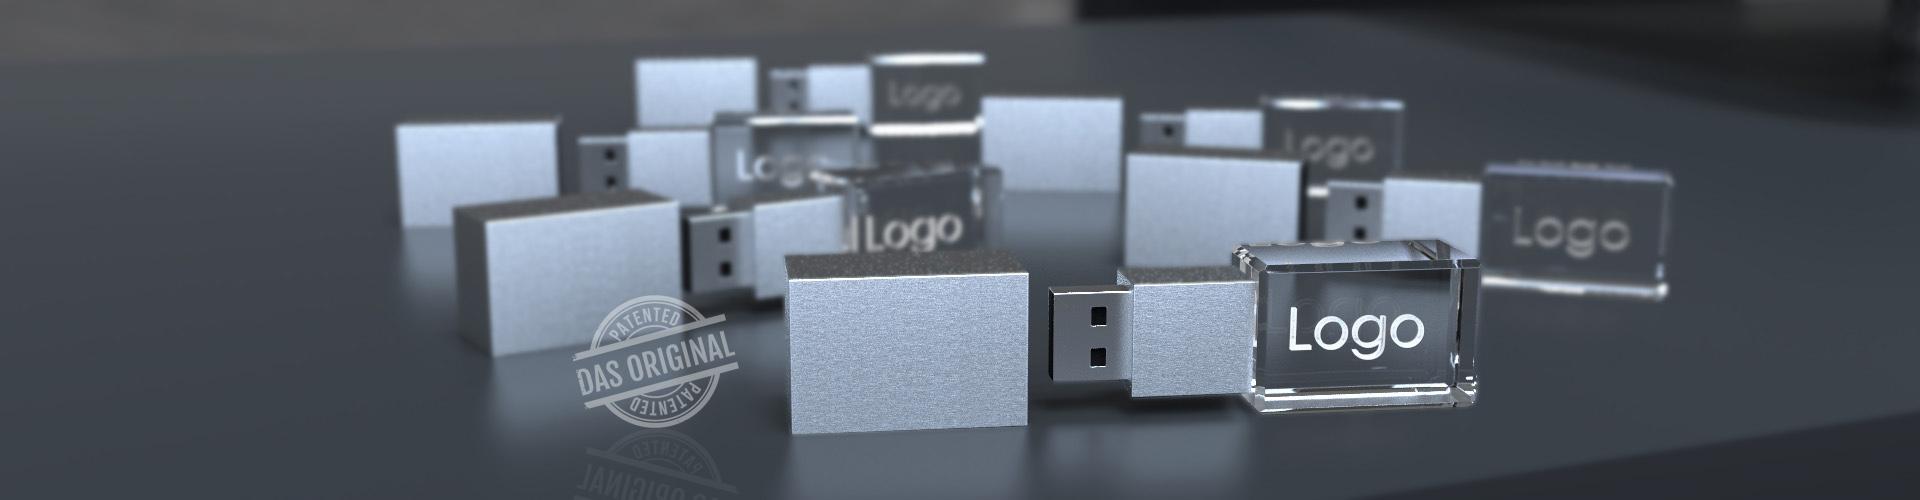 USb Crystal 3d erstes bild 3 - USB CRYSTAL 3D